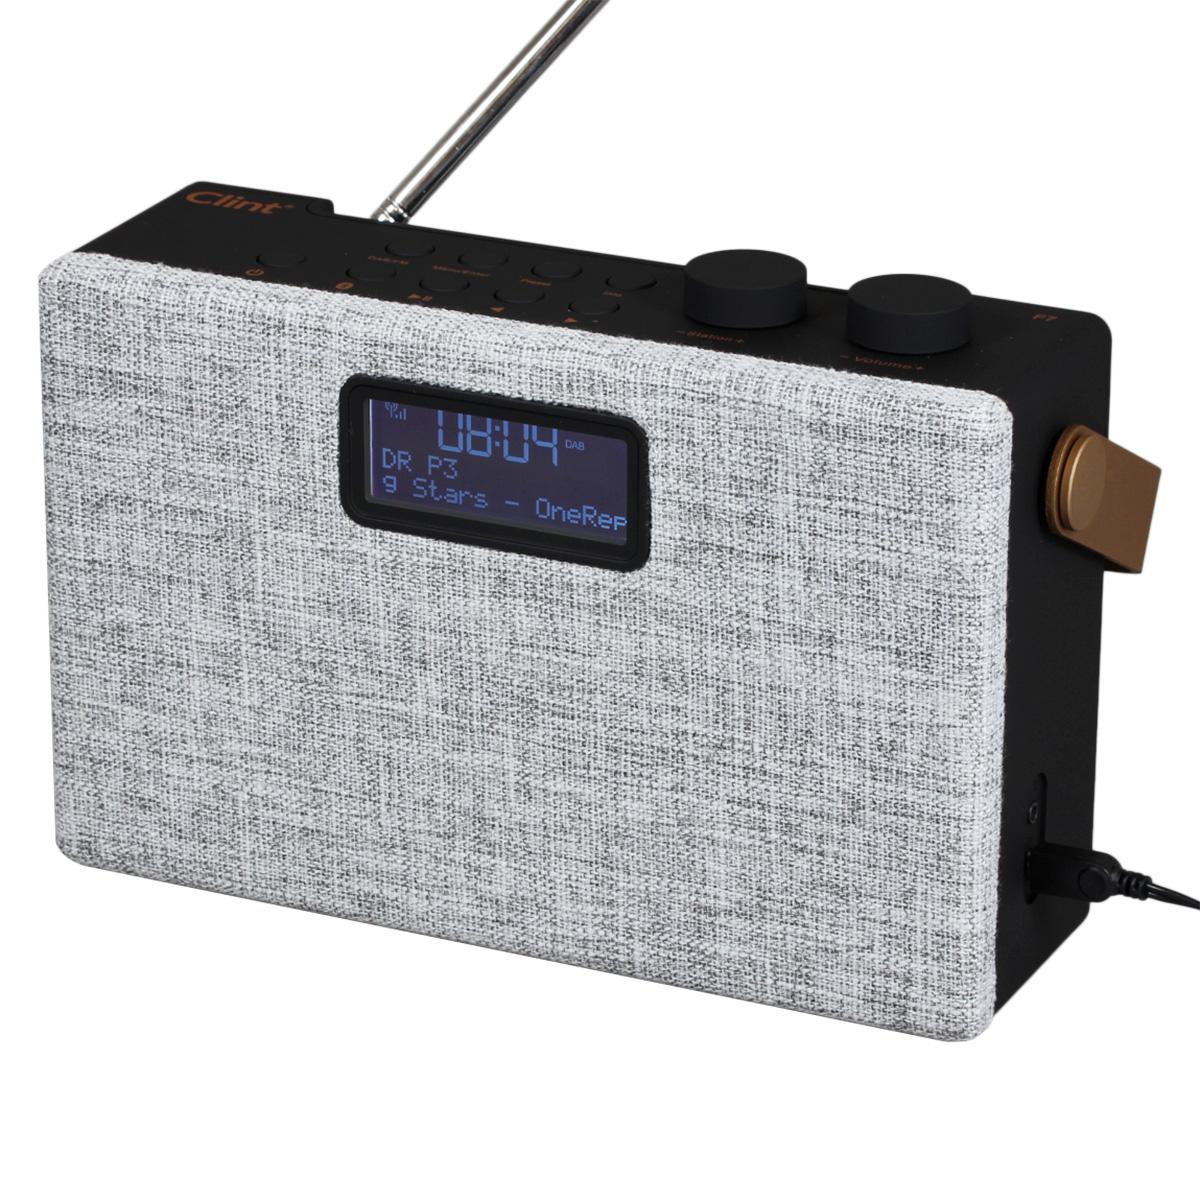 Billede af Clint stereo DAB+/FM radio - Model F7 - Grå